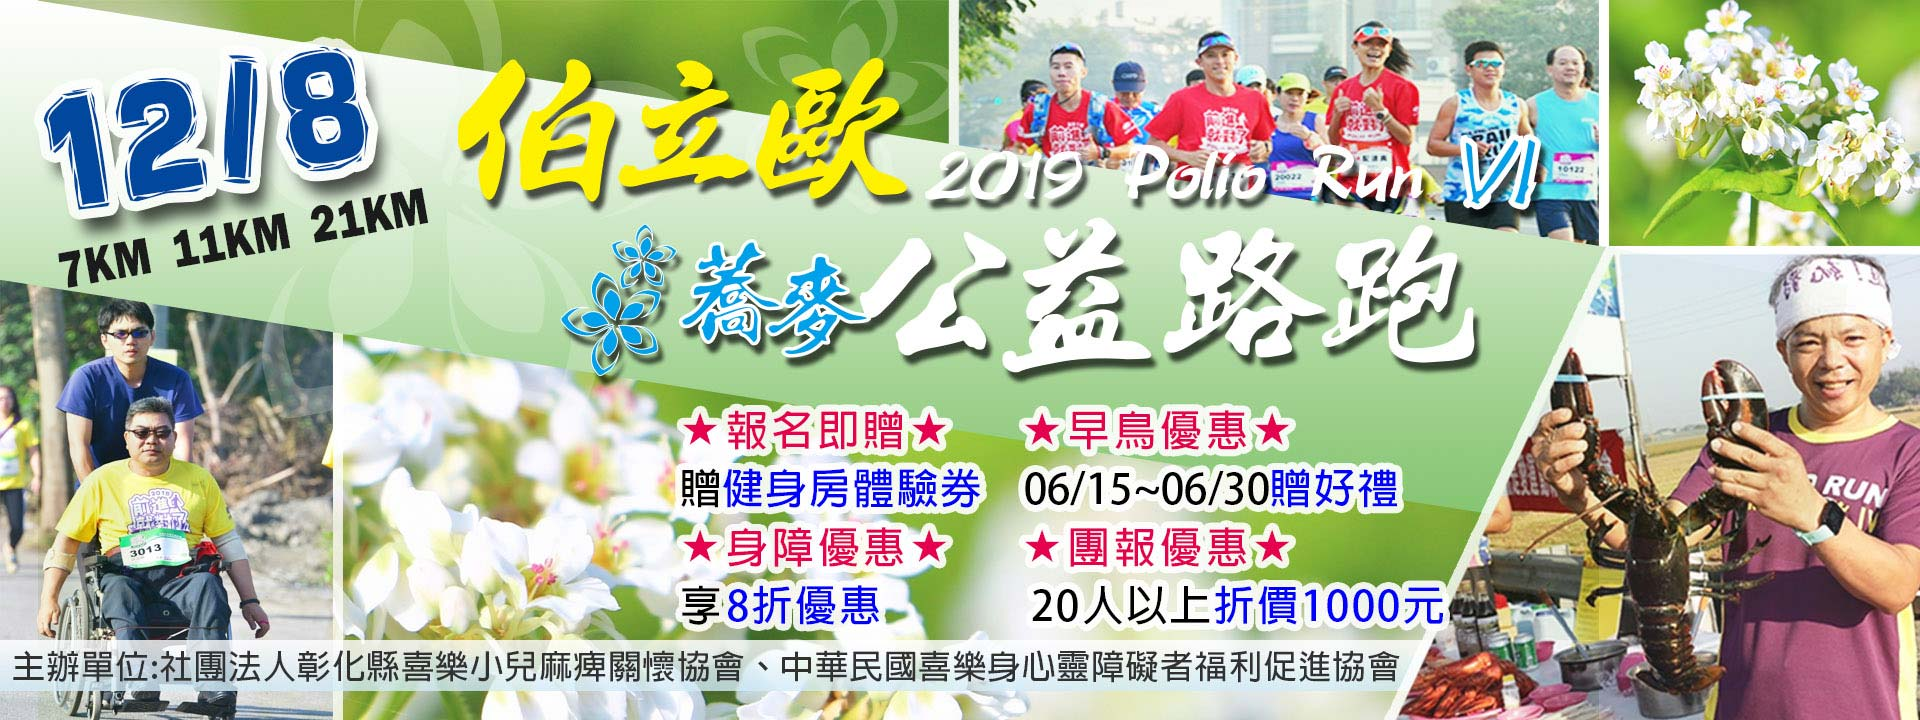 2019 Polio Run VI 伯立歐蕎麥公益路跑